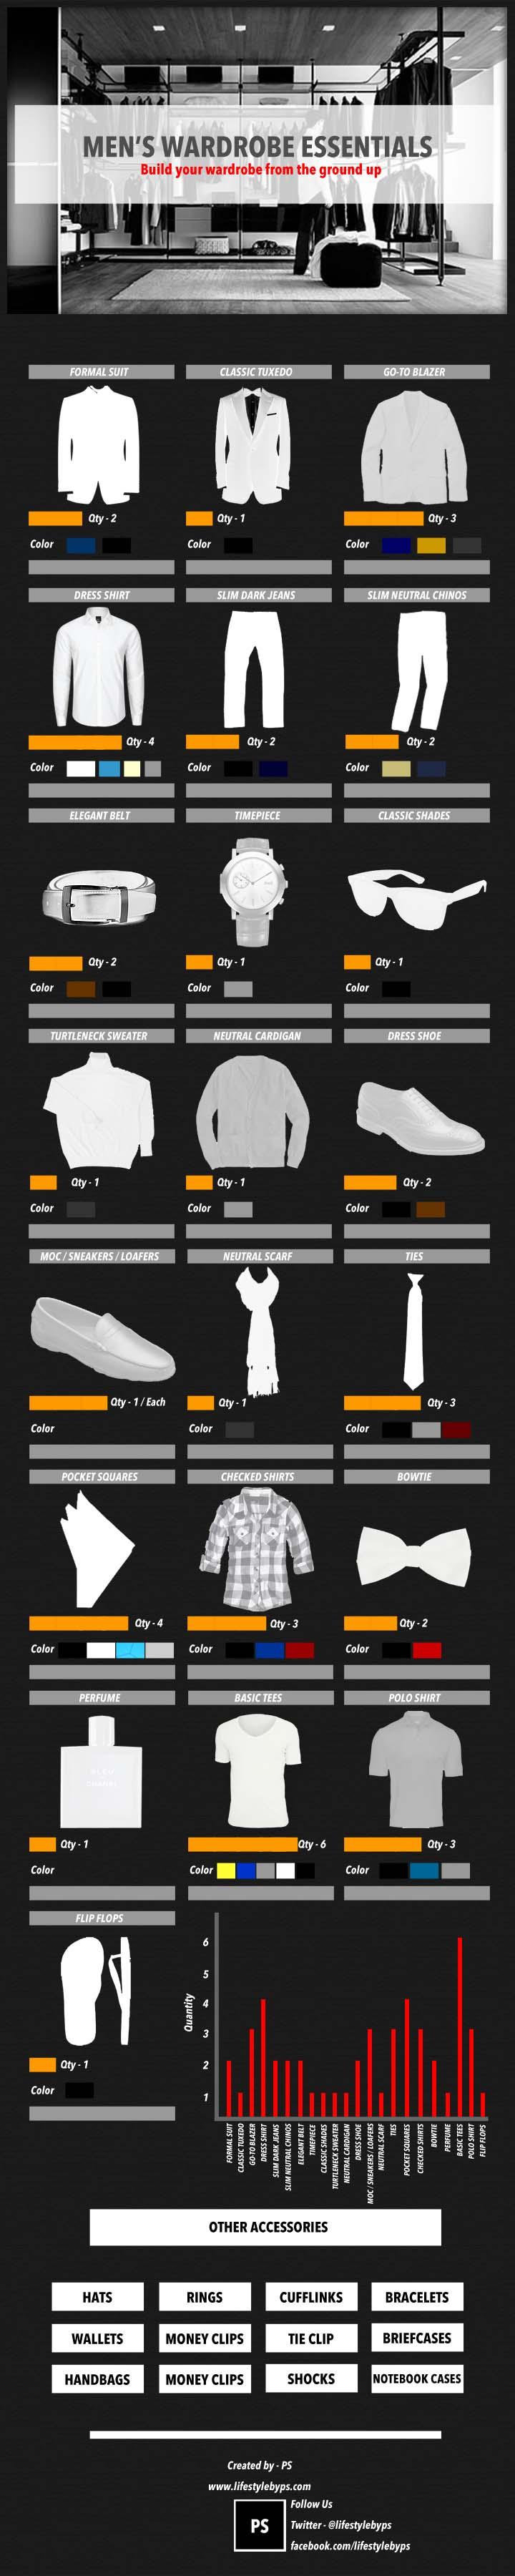 Business-Casual-Wardrobe